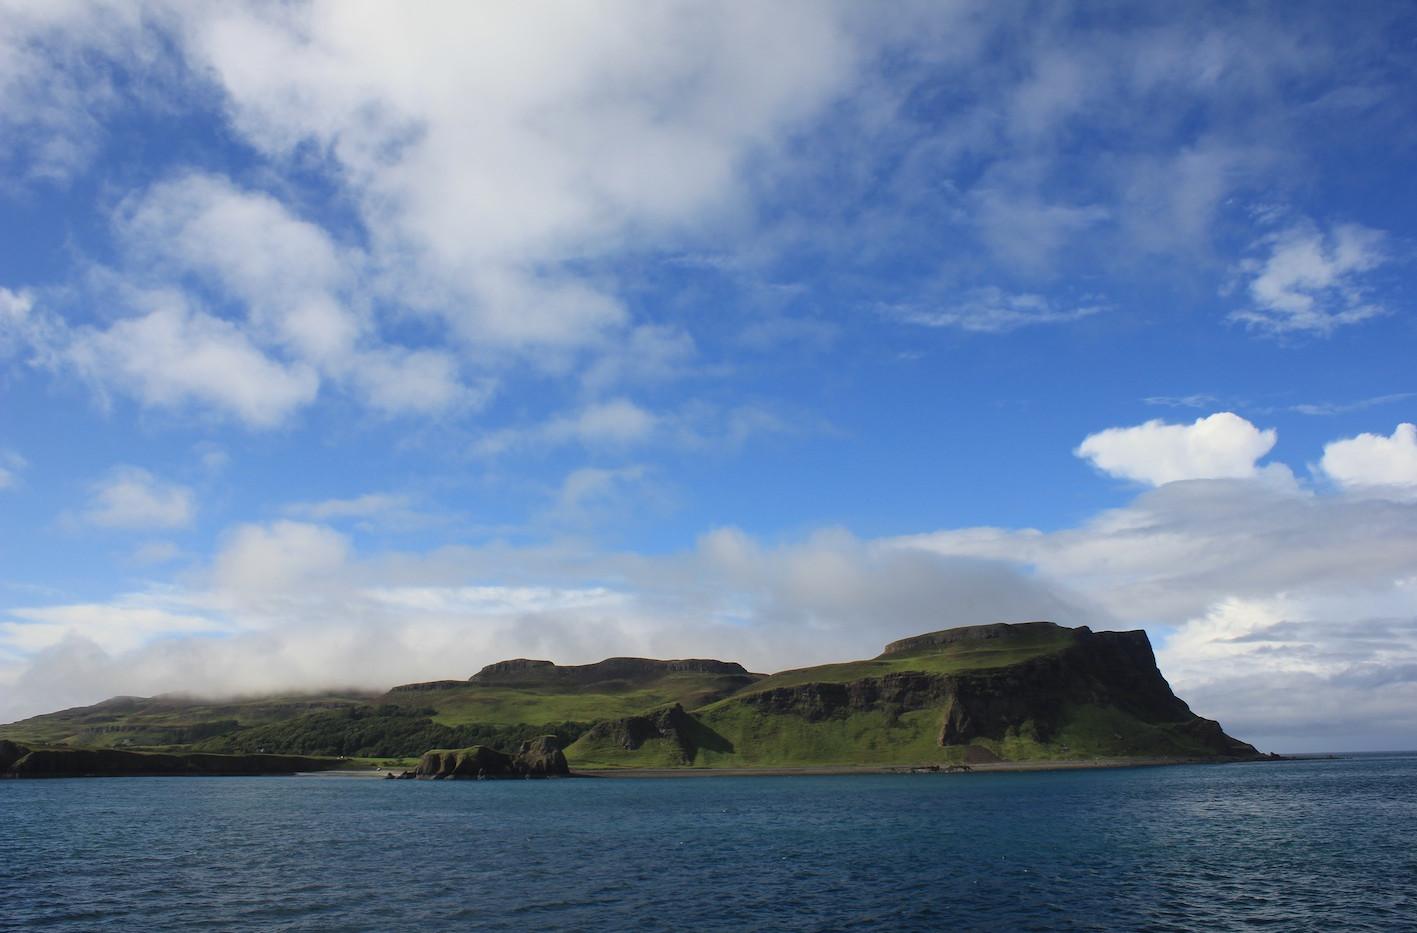 Ferry towards Isle of Canna